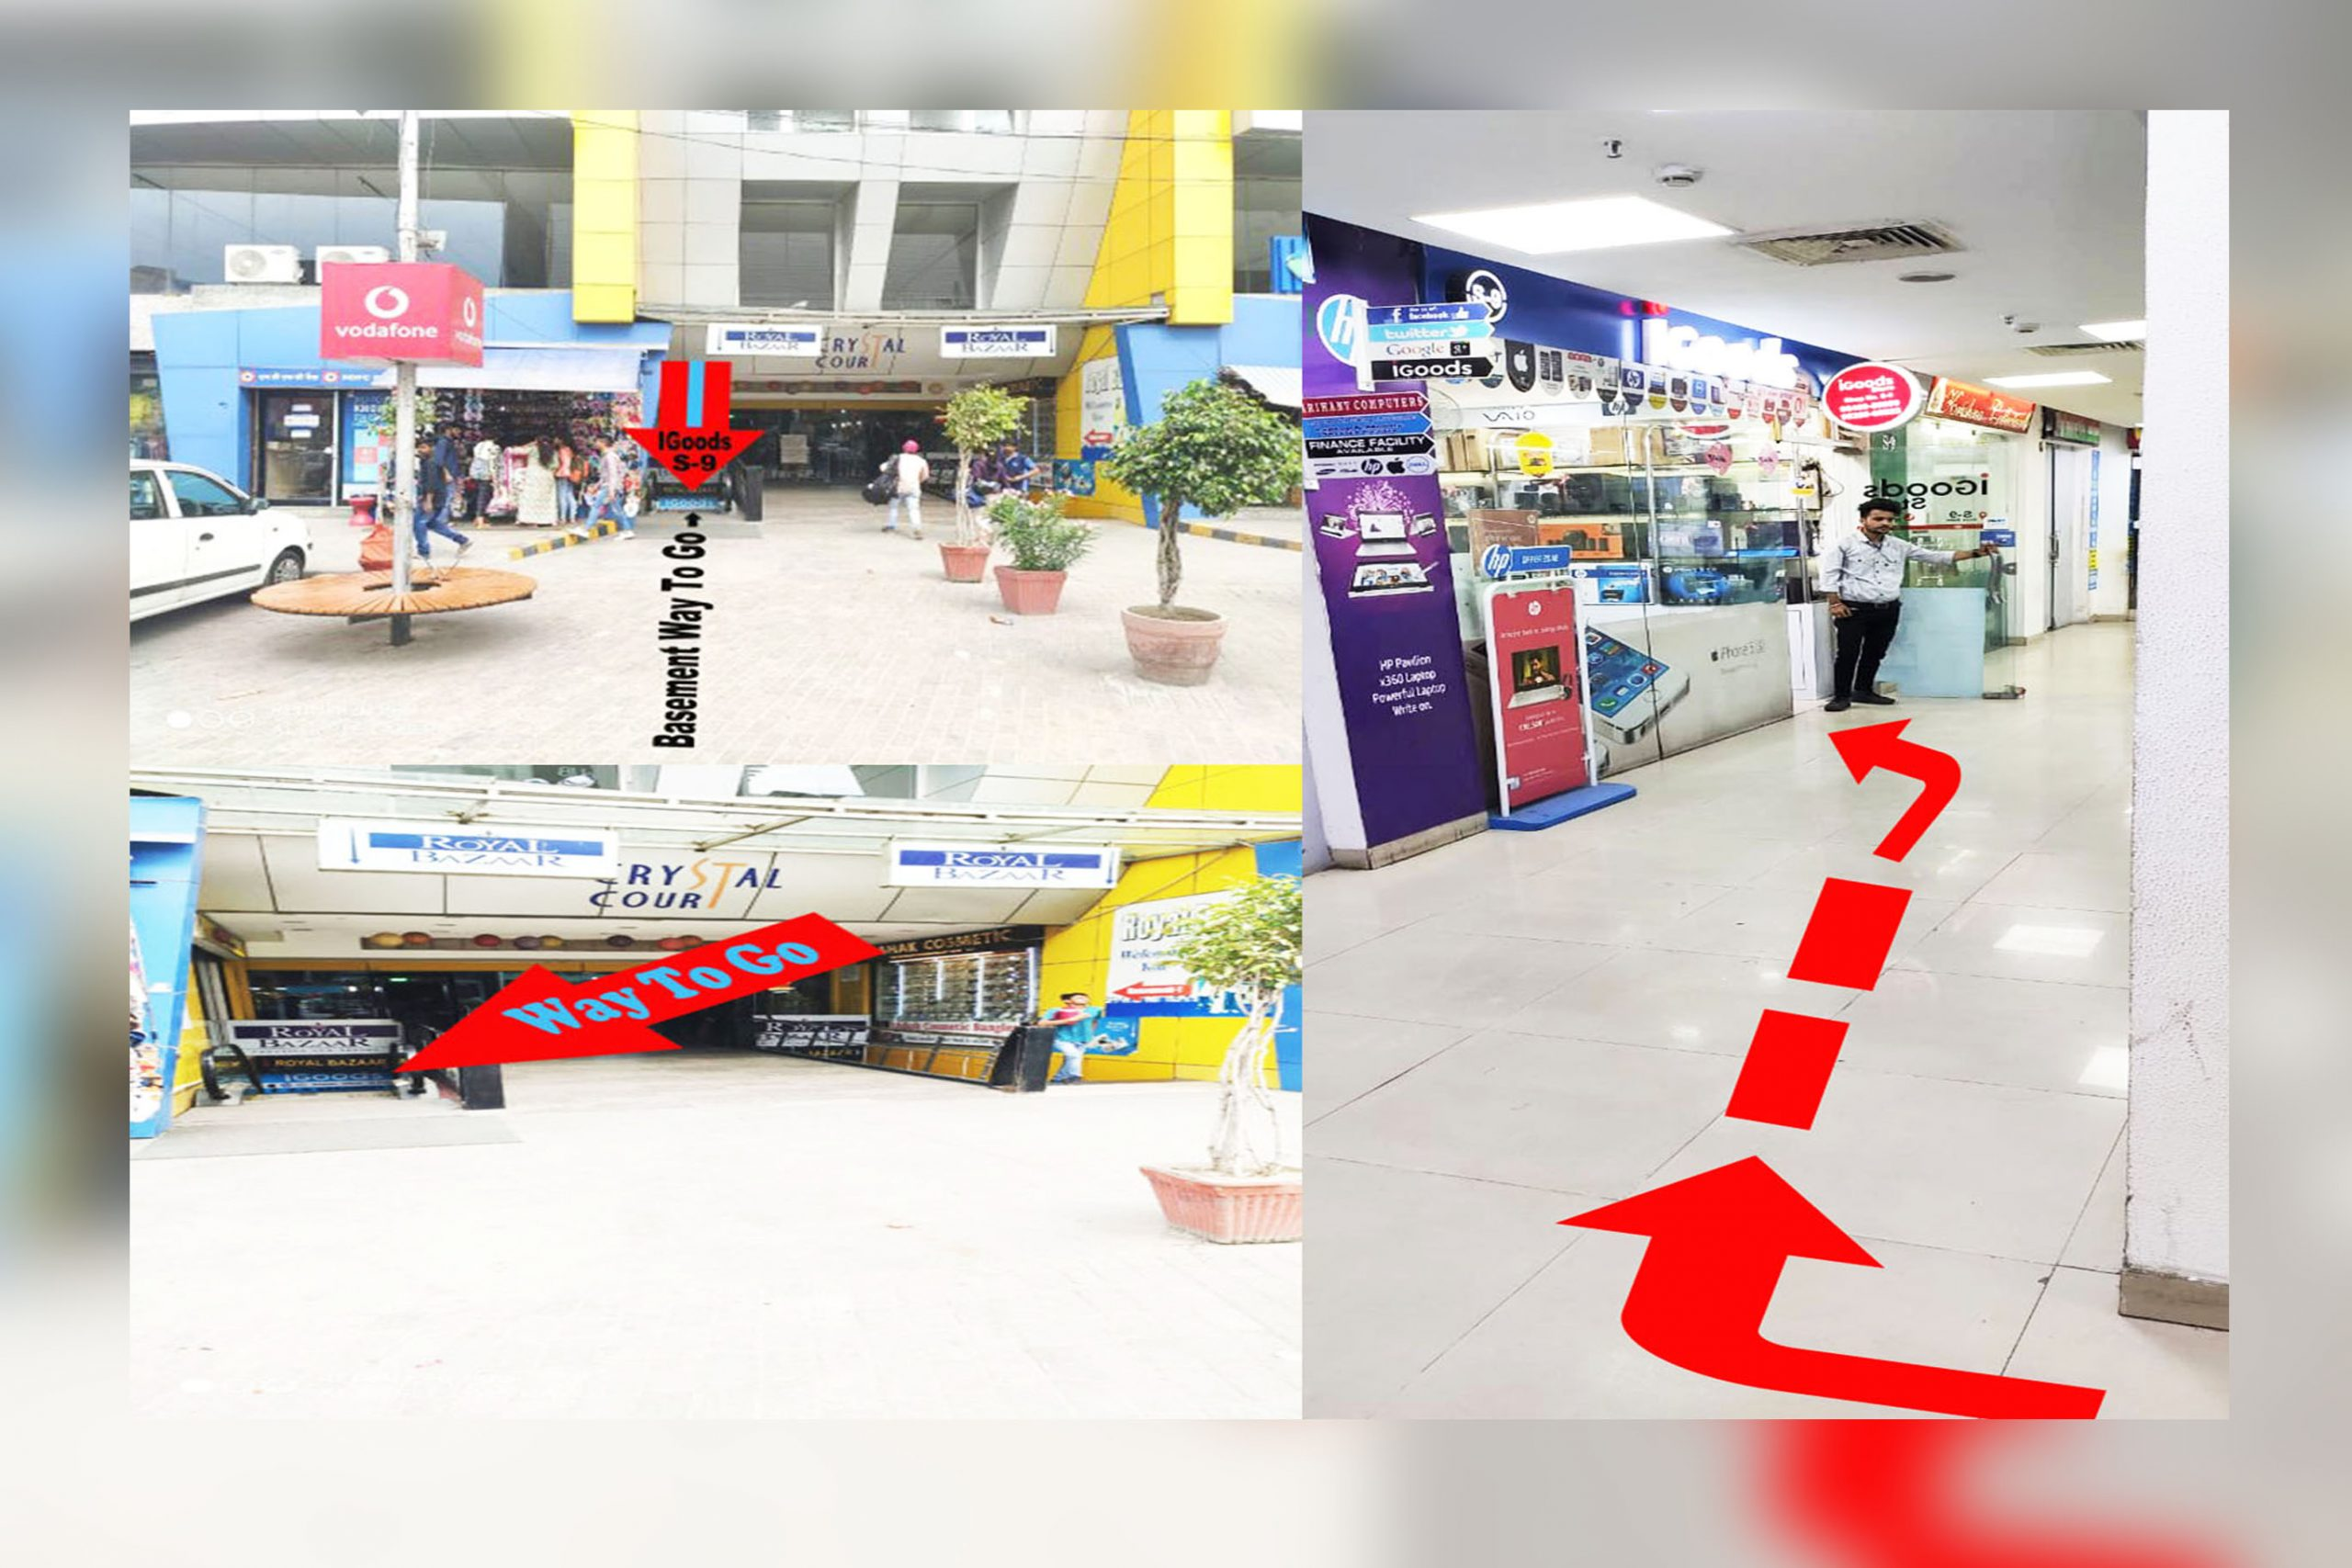 whatsaap internal settingigoods-location-with-landmark-address-in-jaipur-302017